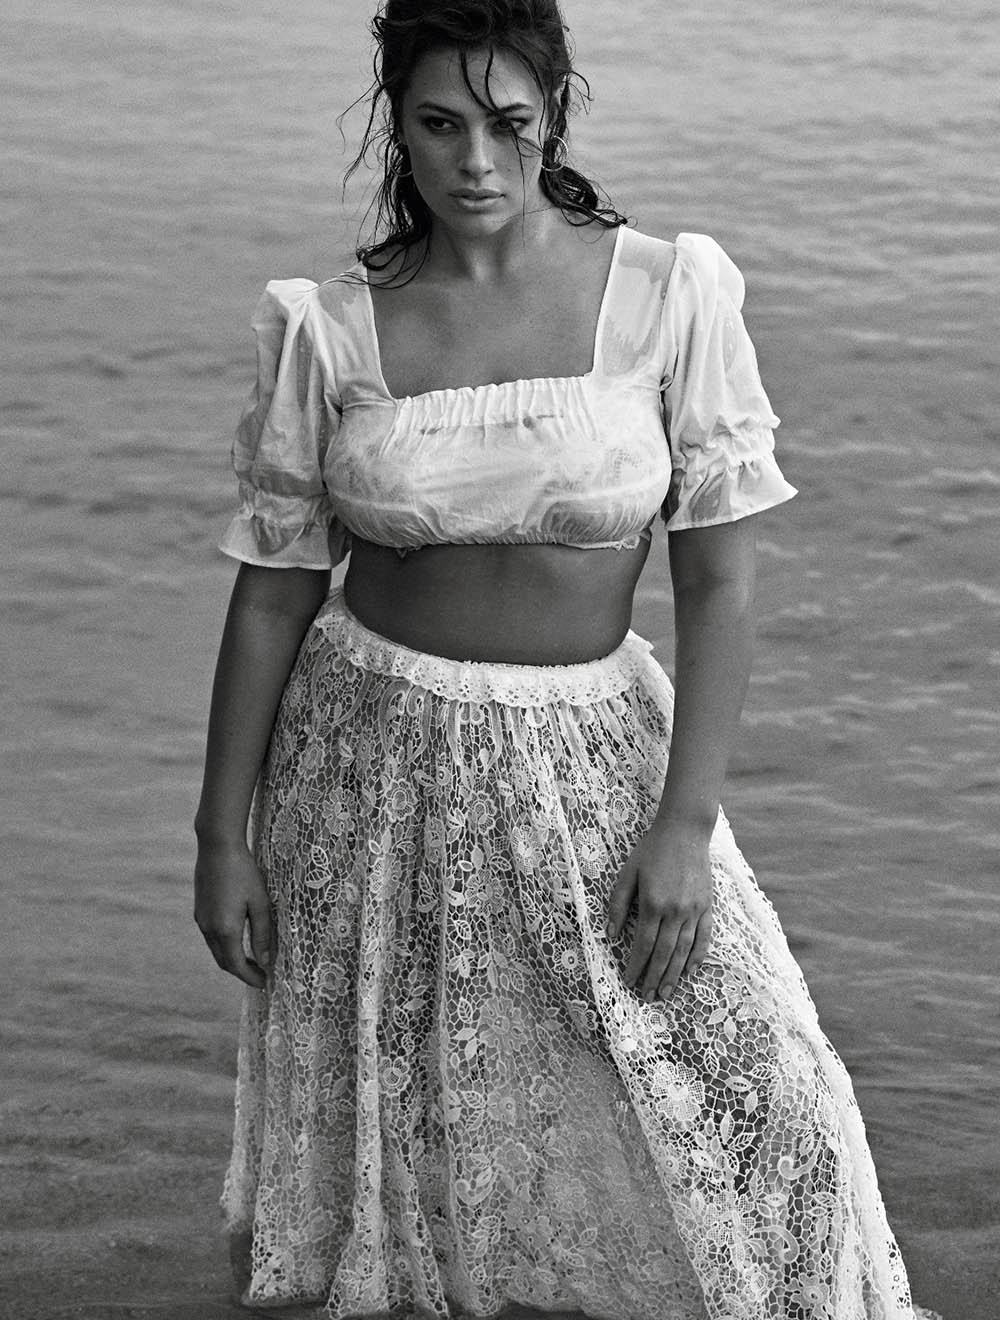 Ashley-Graham-by-Lachlan-Bailey-for-Vogue-Paris-November-2018-14.jpg